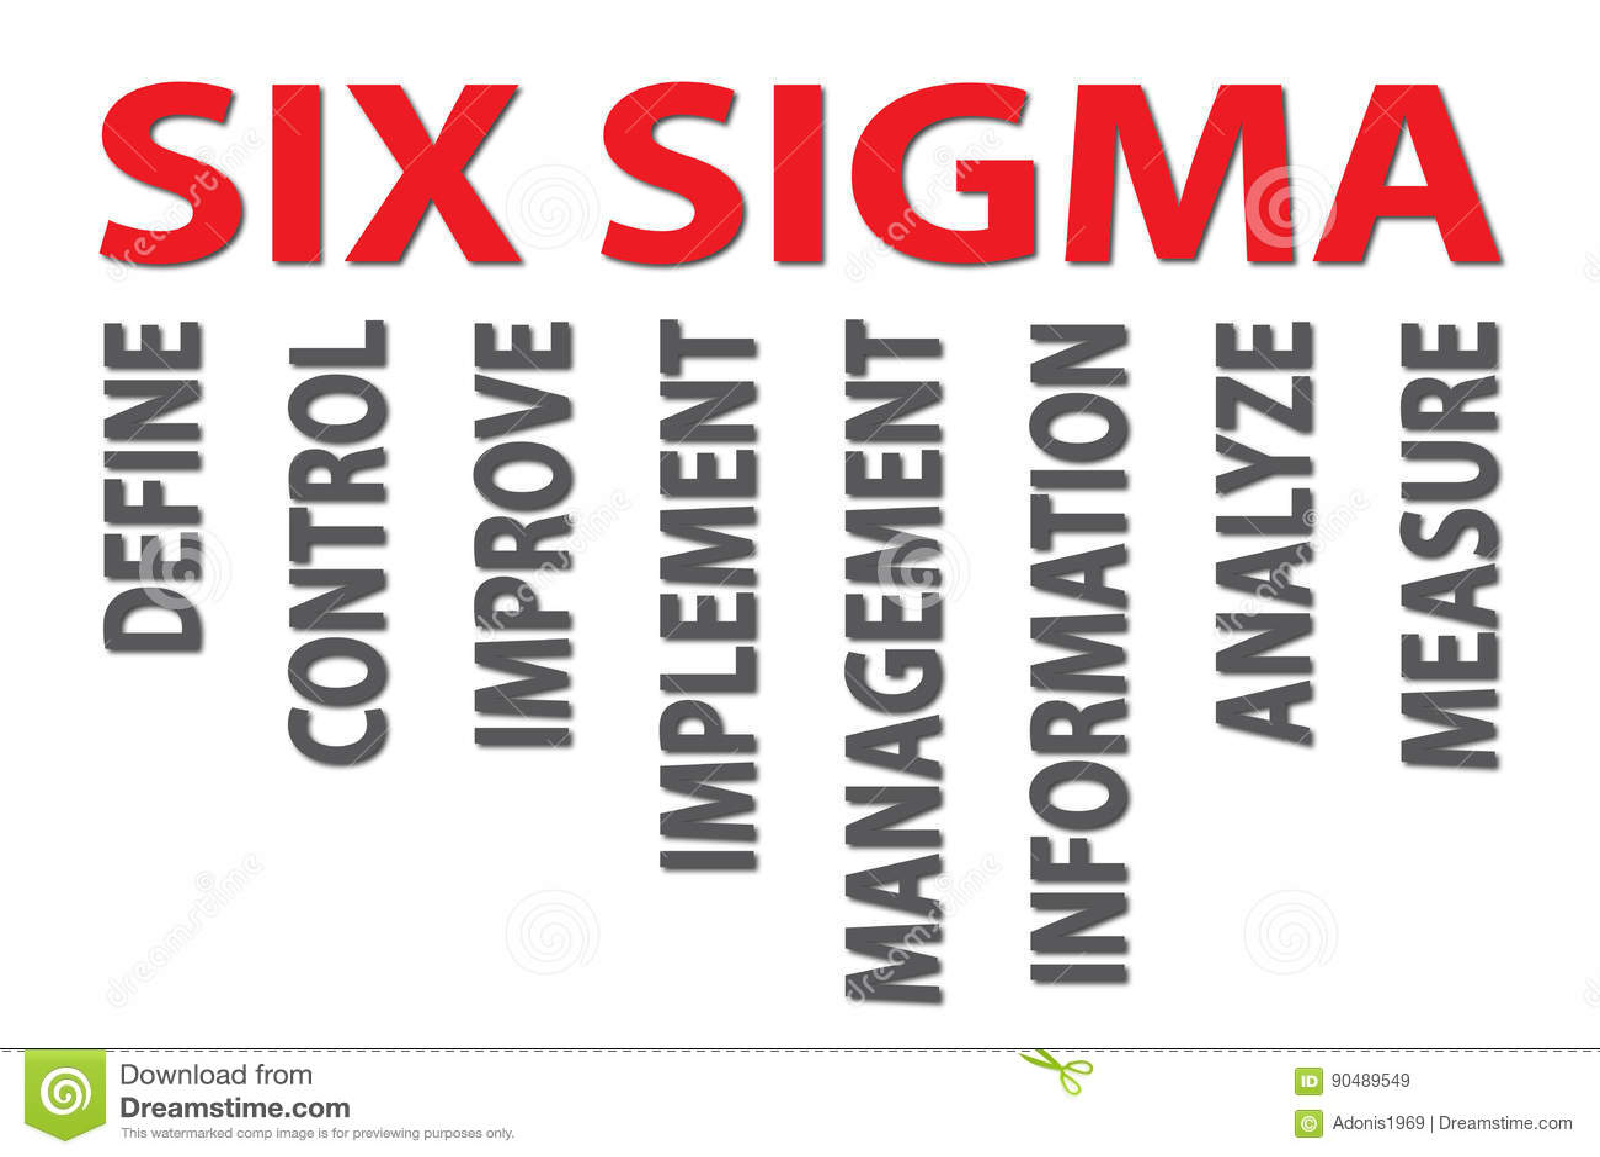 Sigma sechs